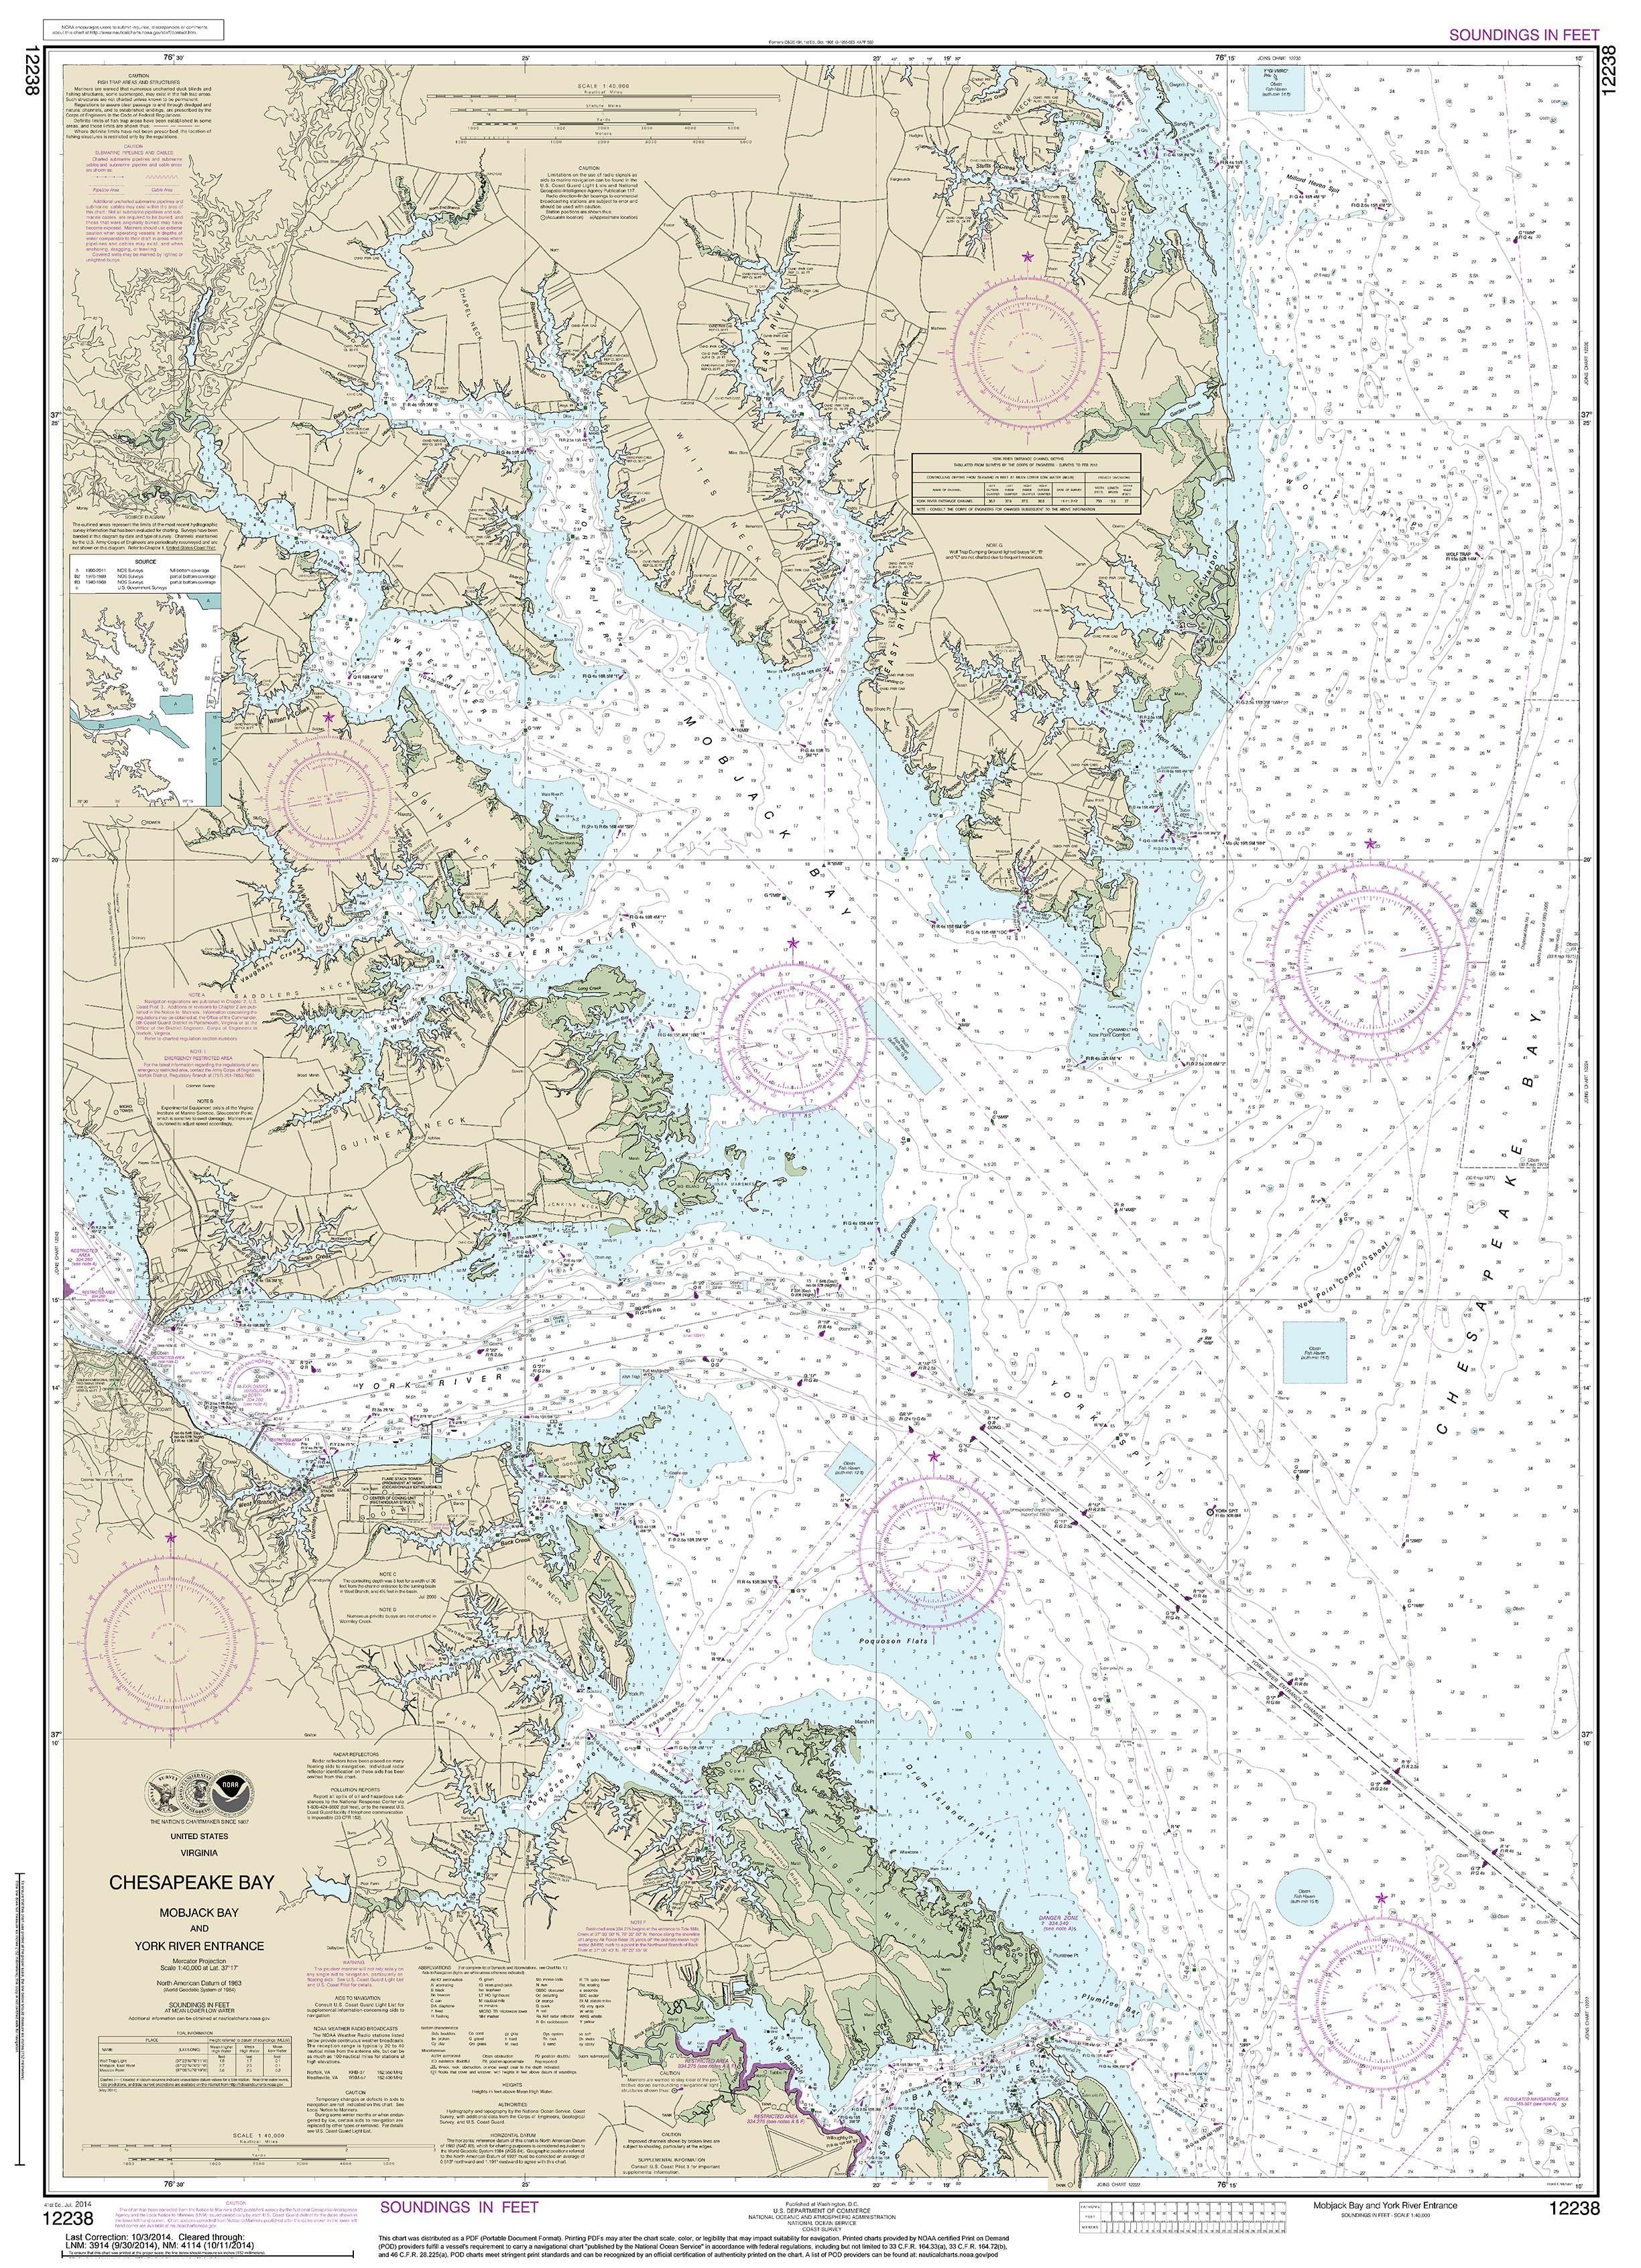 Modern Nautical Charts of the Chesapeake Bay